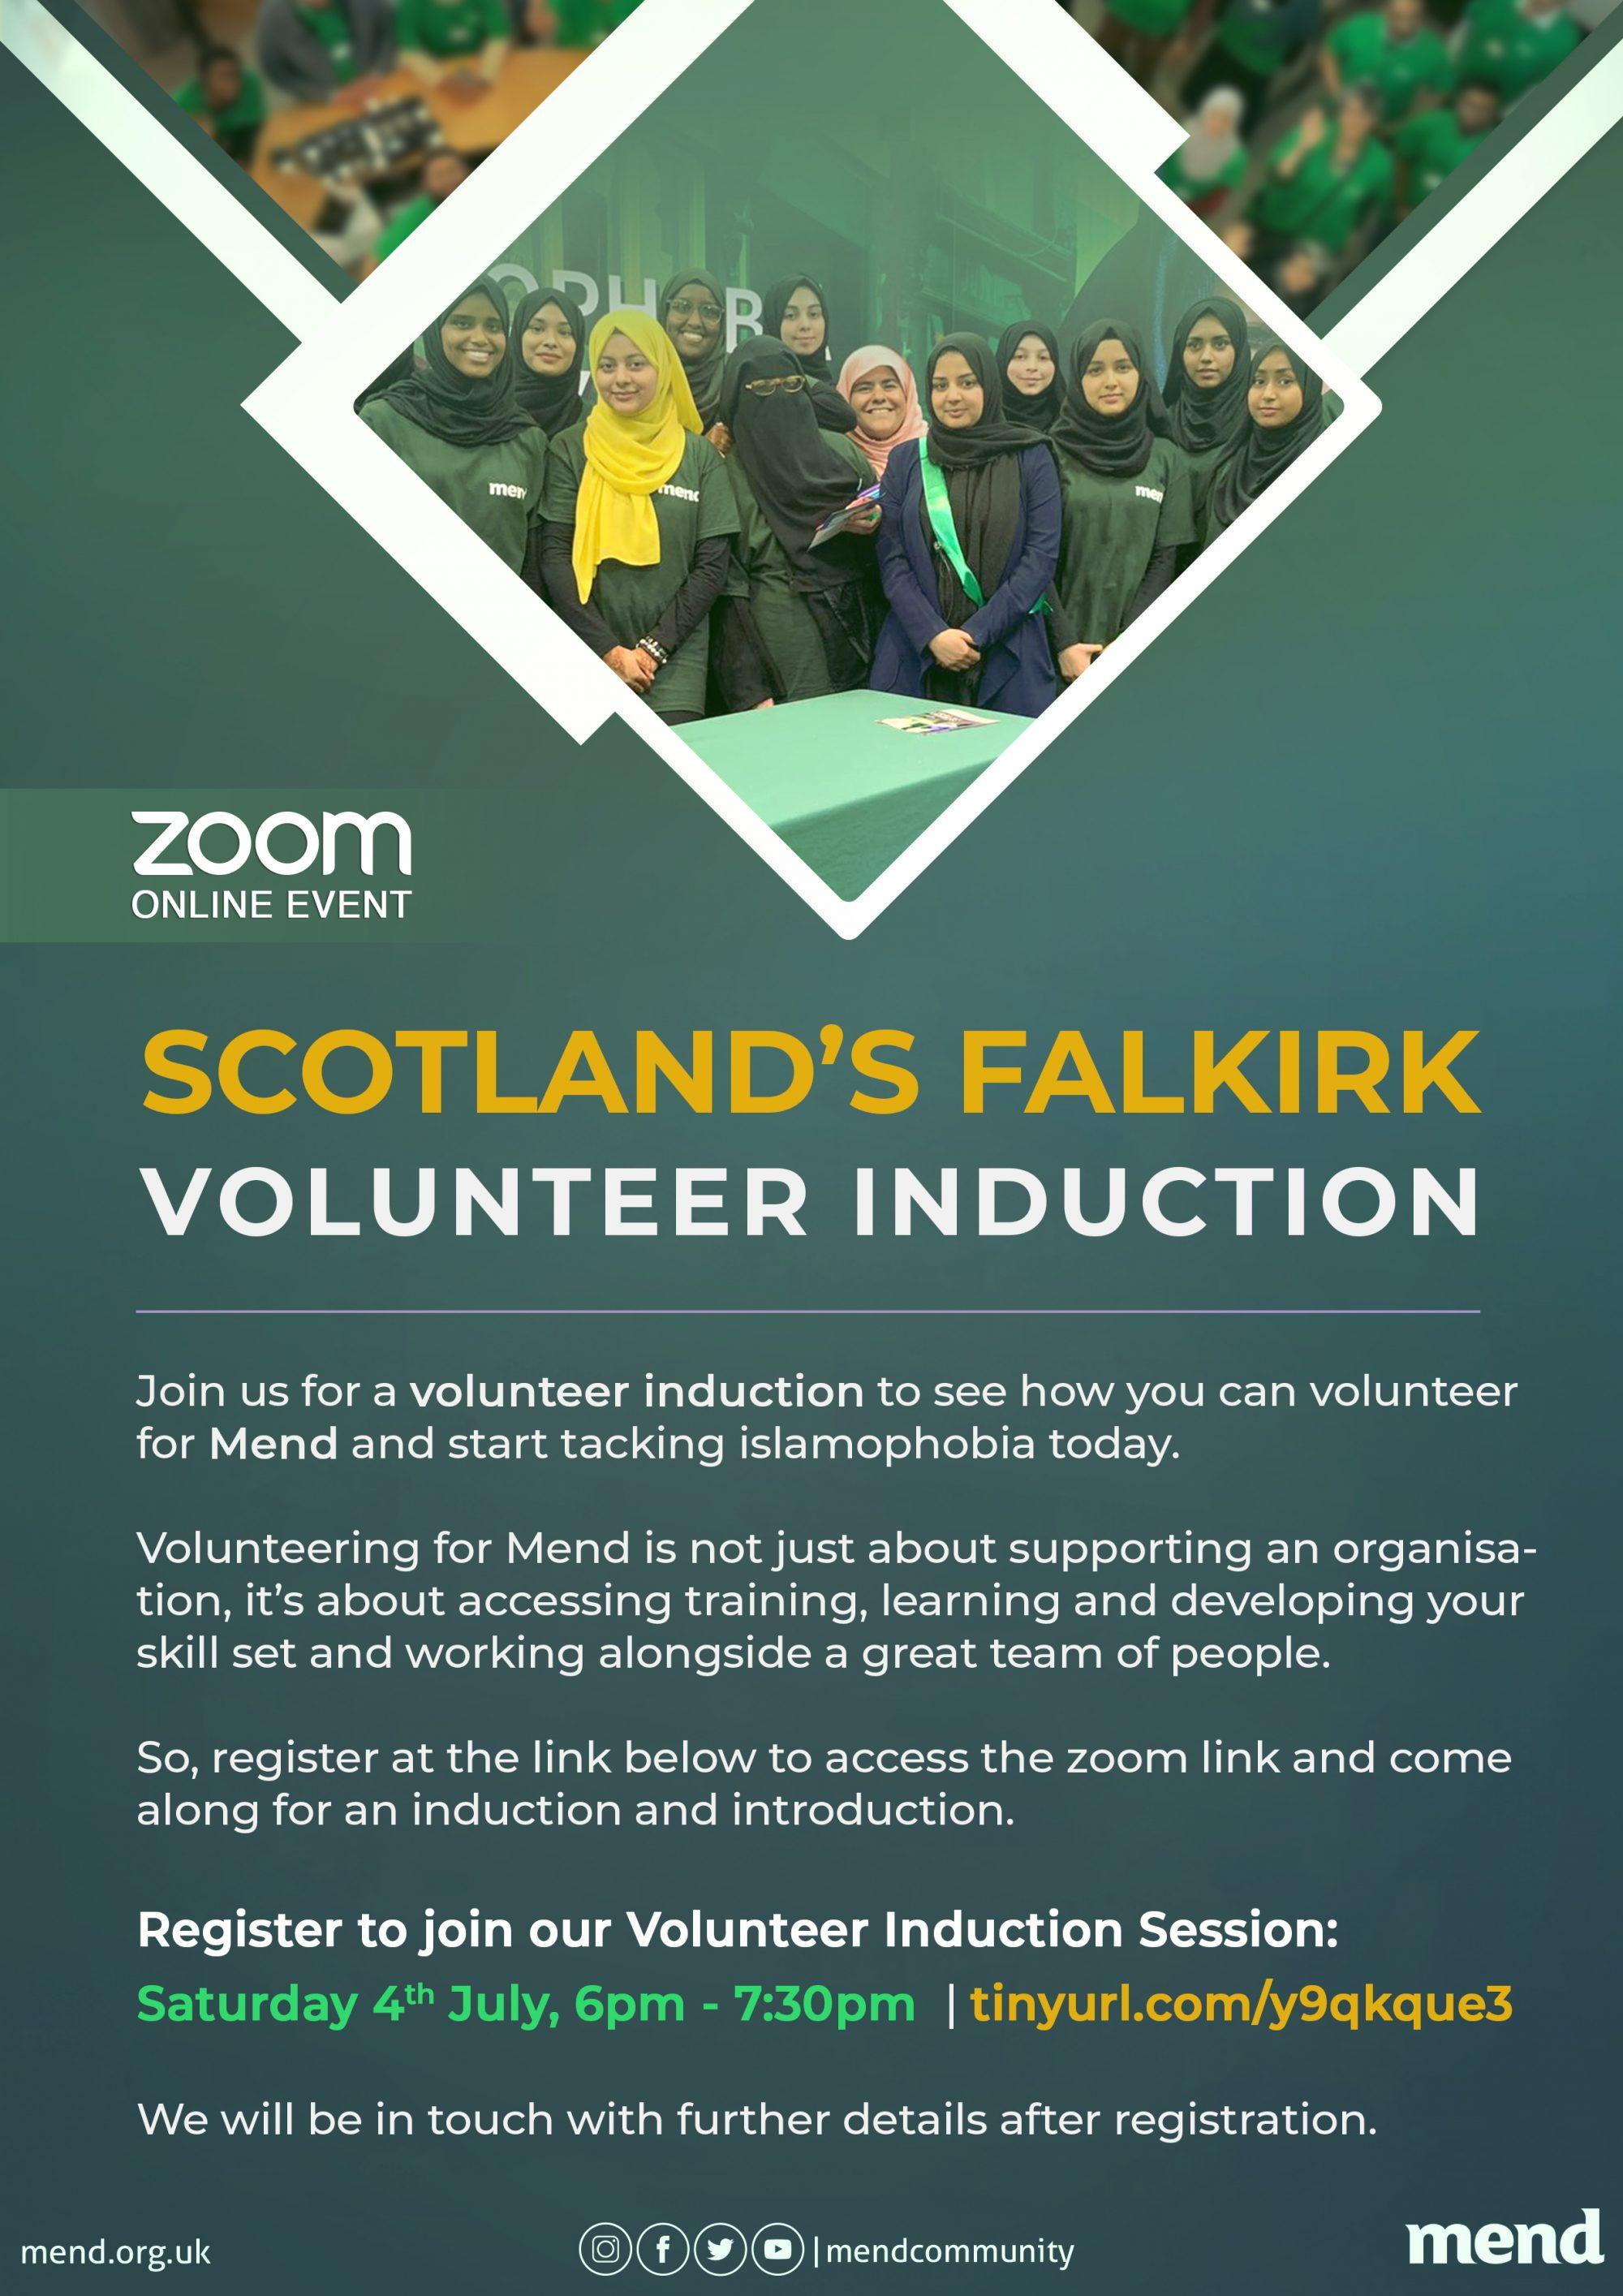 MEND New Volunteer Induction, Falkirk Scotland.